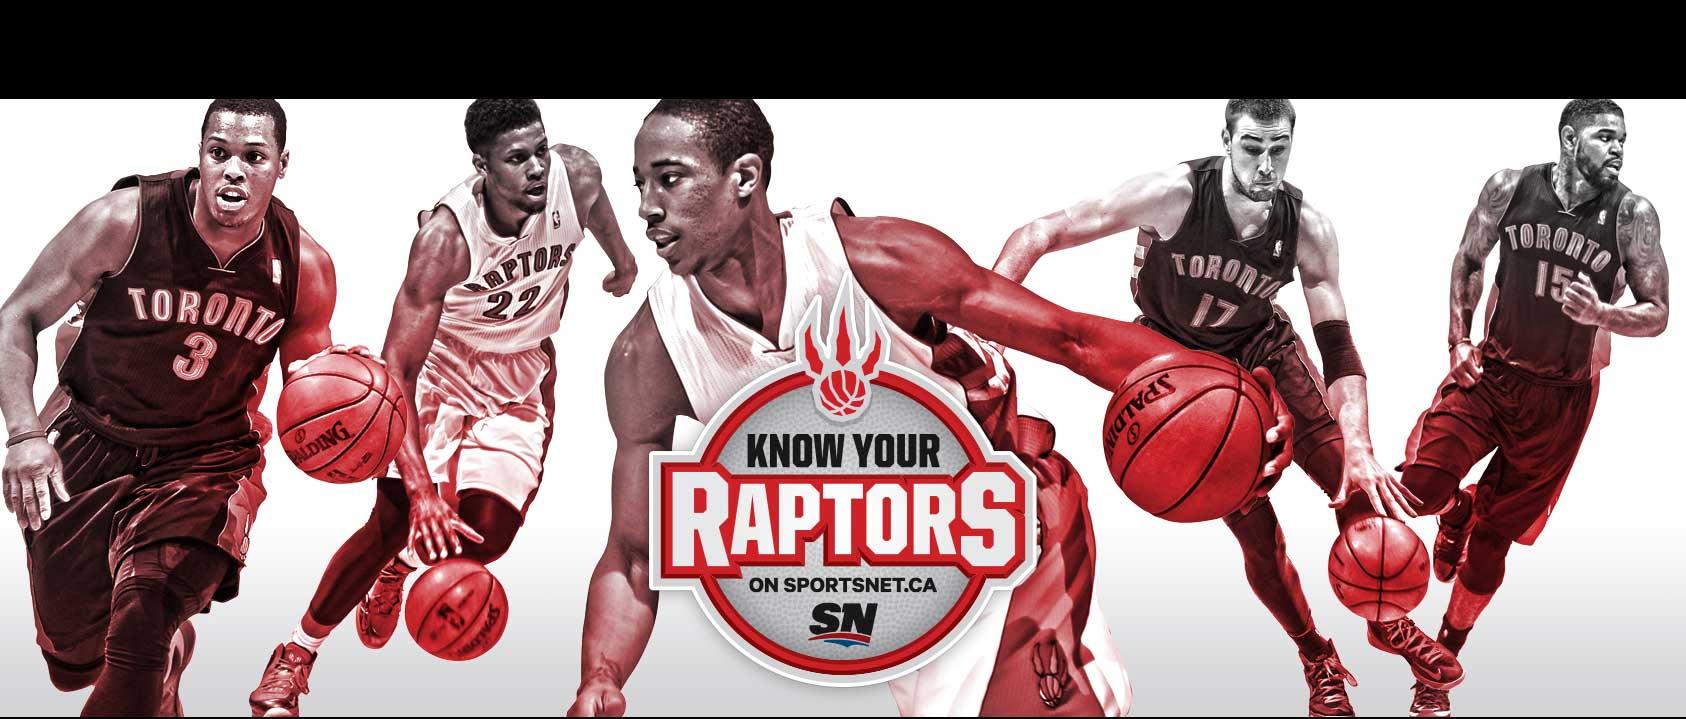 Know Your Toronto Raptors